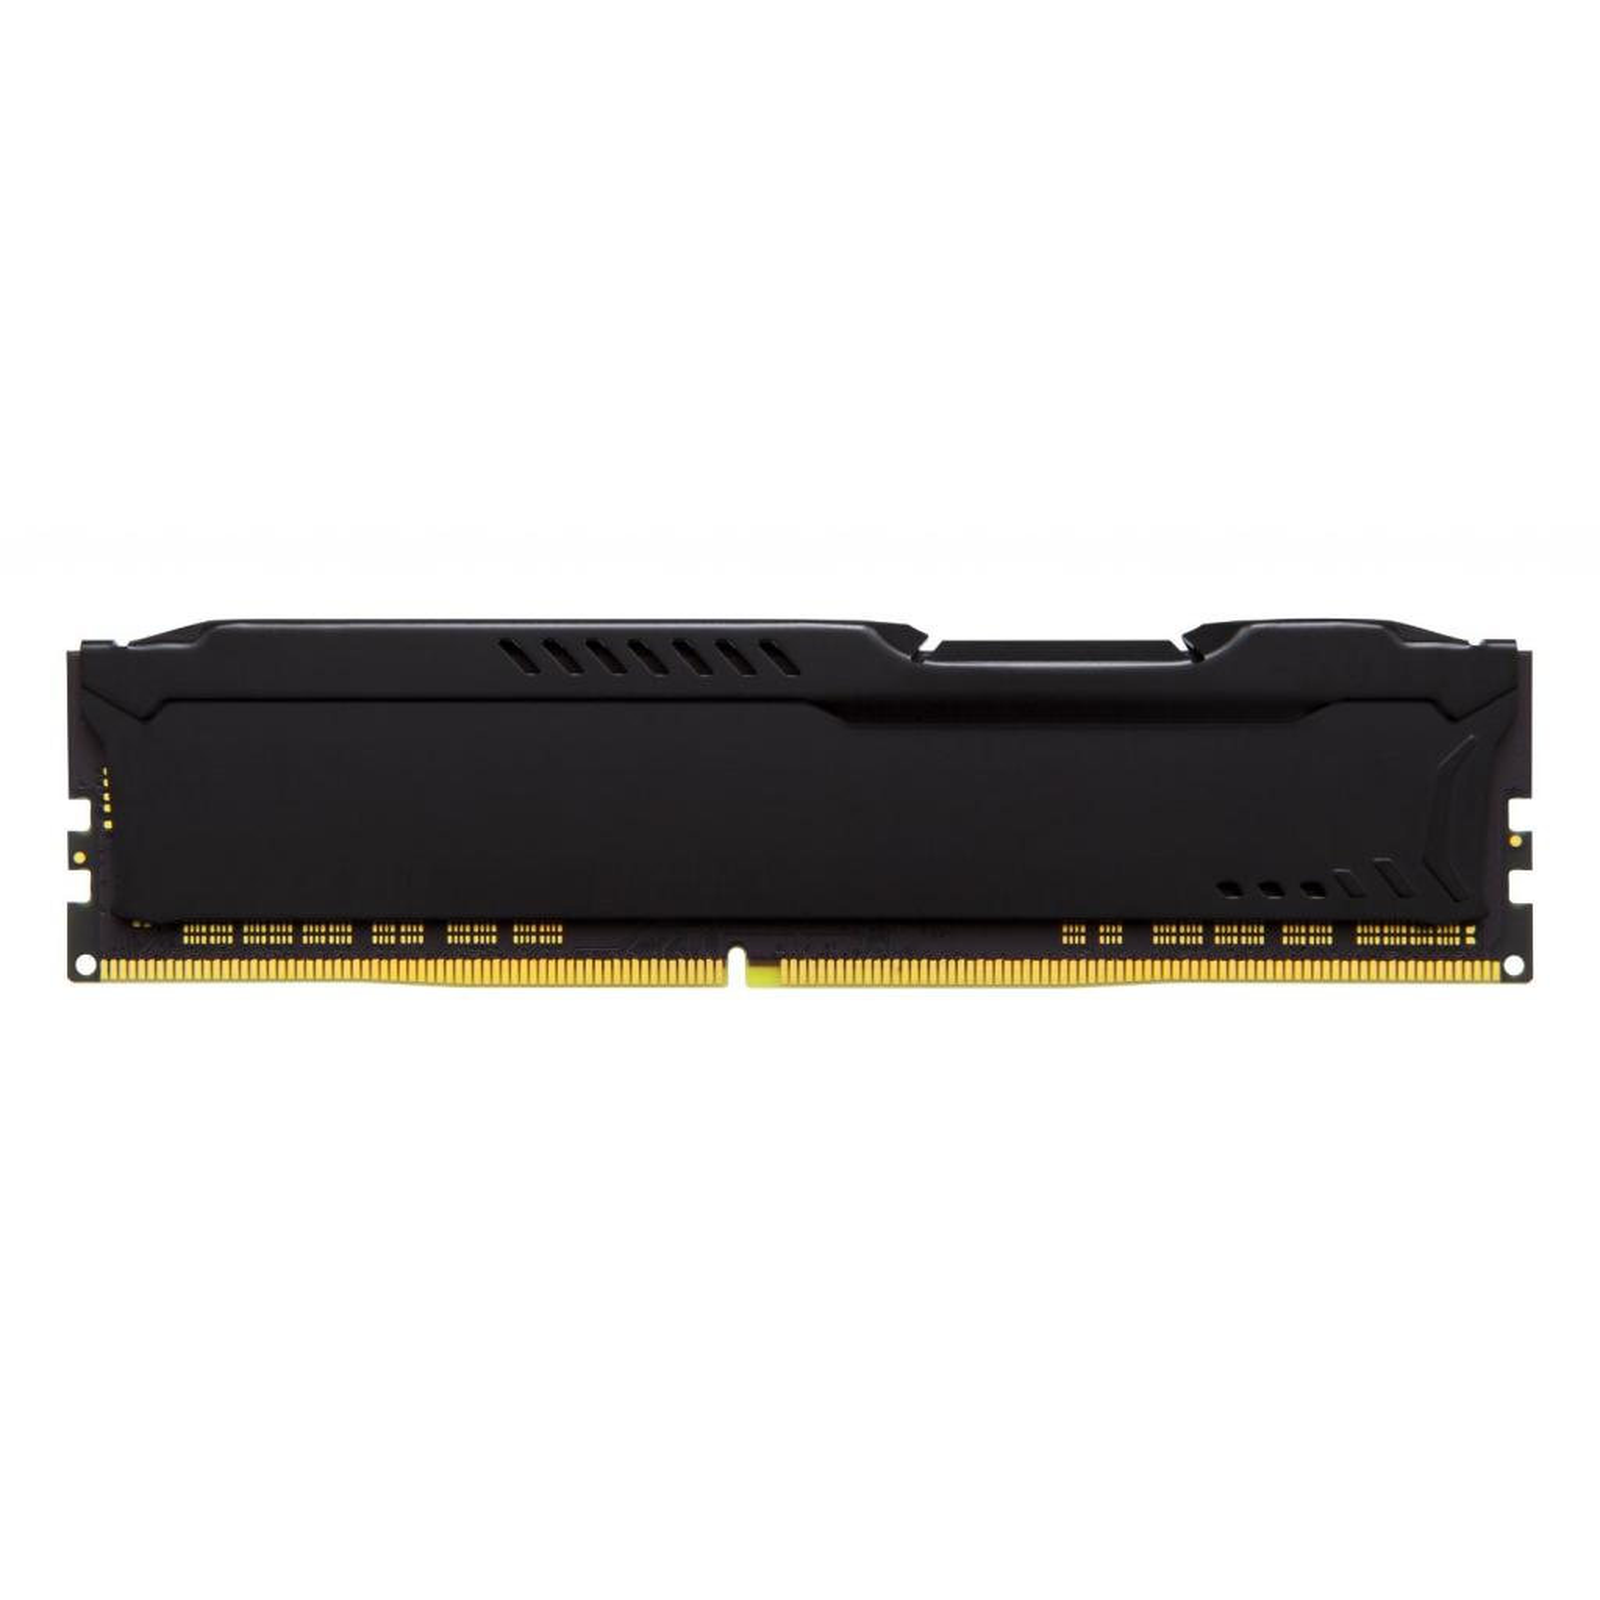 Модуль памяти для компьютера DDR4 8GB 2400 MHz HyperX FURY Black Kingston (HX424C15FB2/8) изображение 3